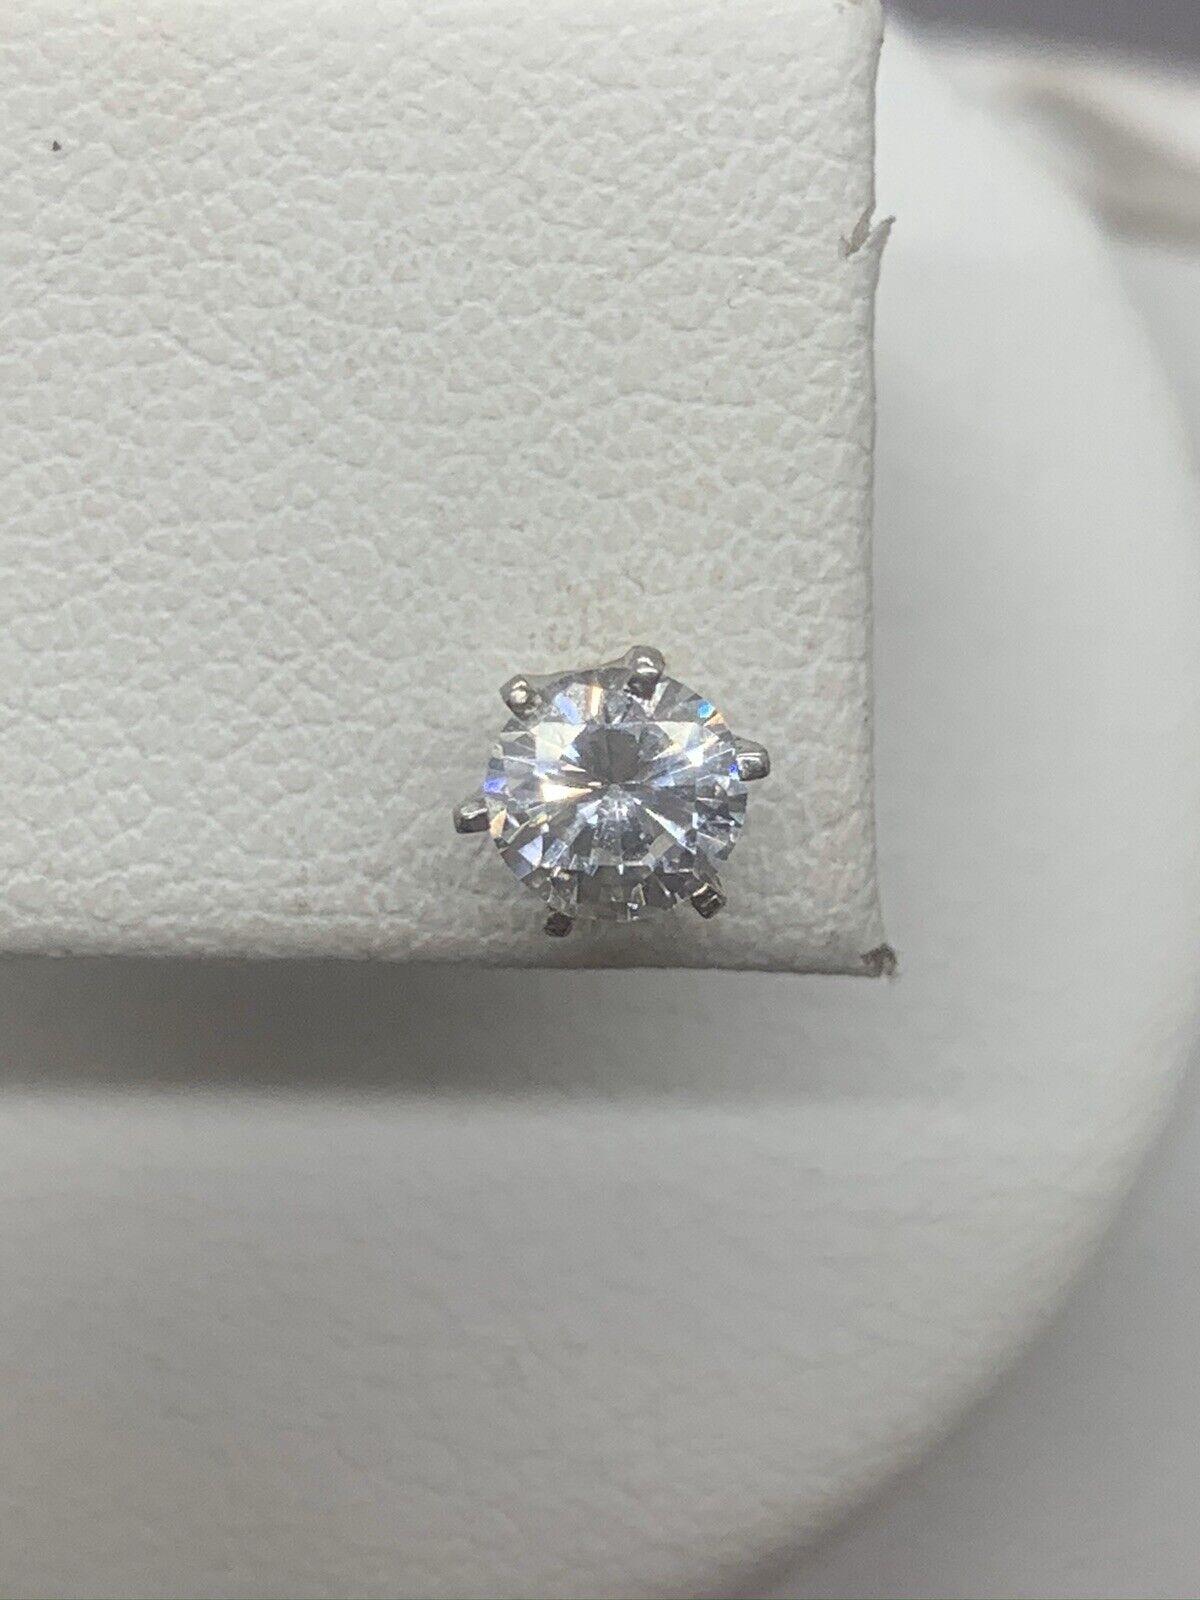 Vinatge Signed Monet Crystal Stud Earrings - image 3